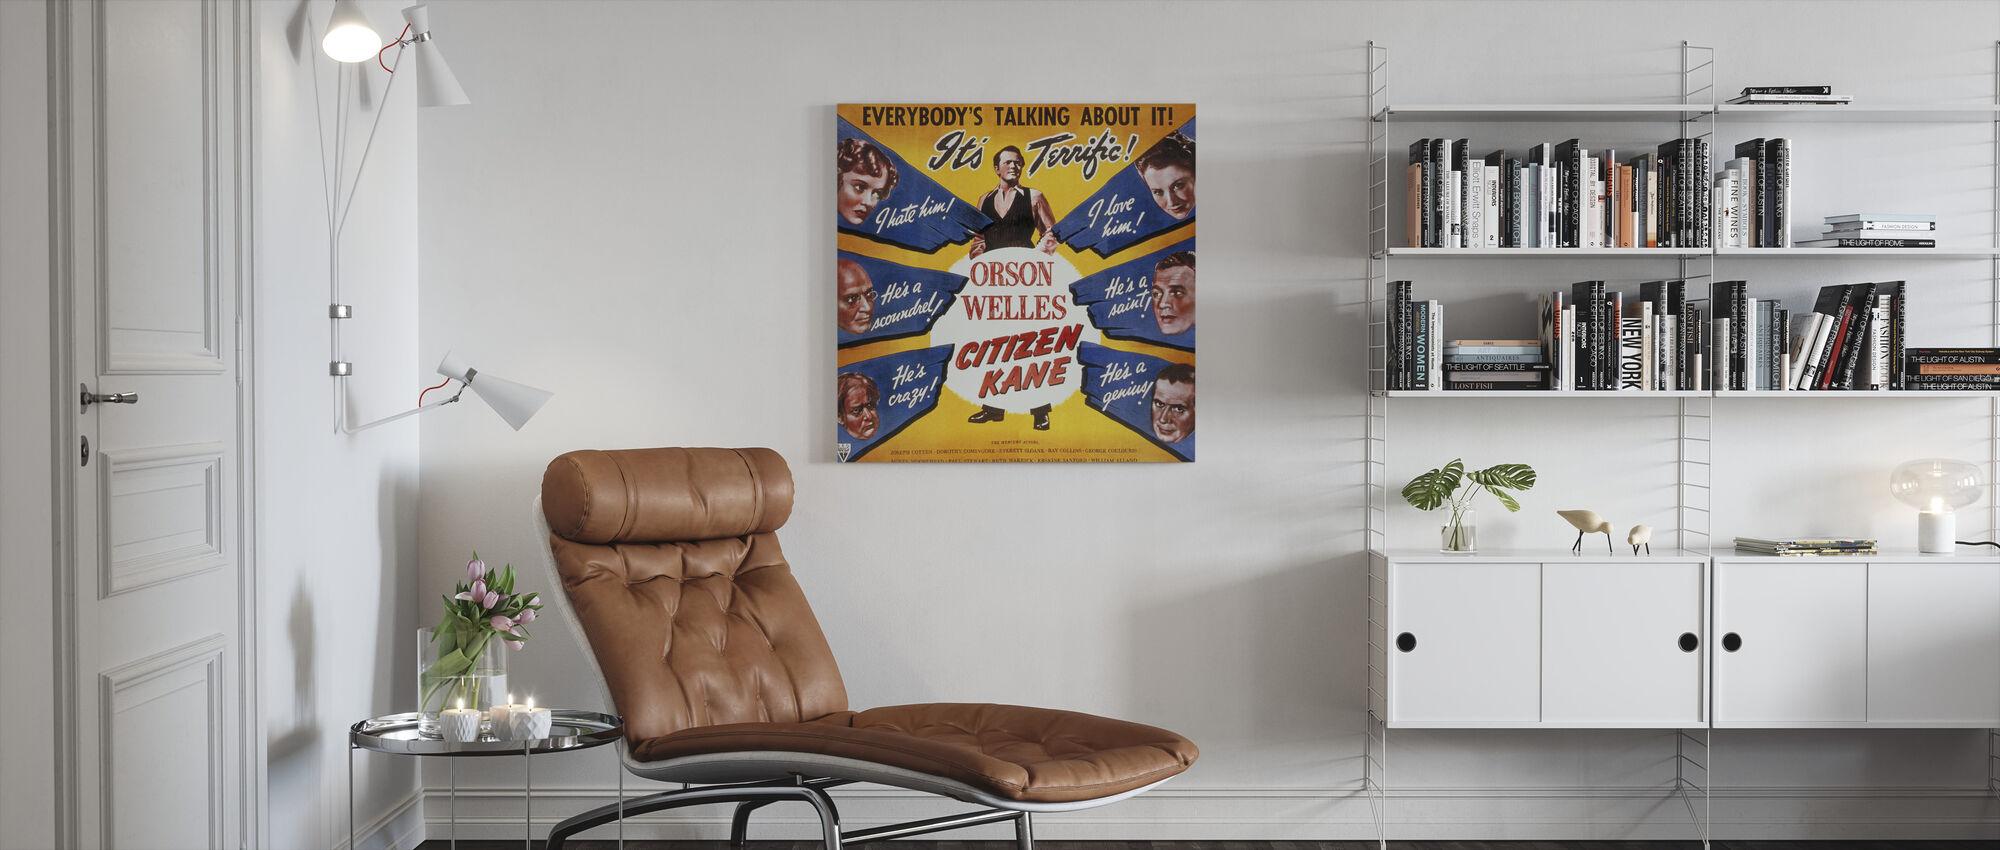 Citizen Kane - Canvas print - Living Room